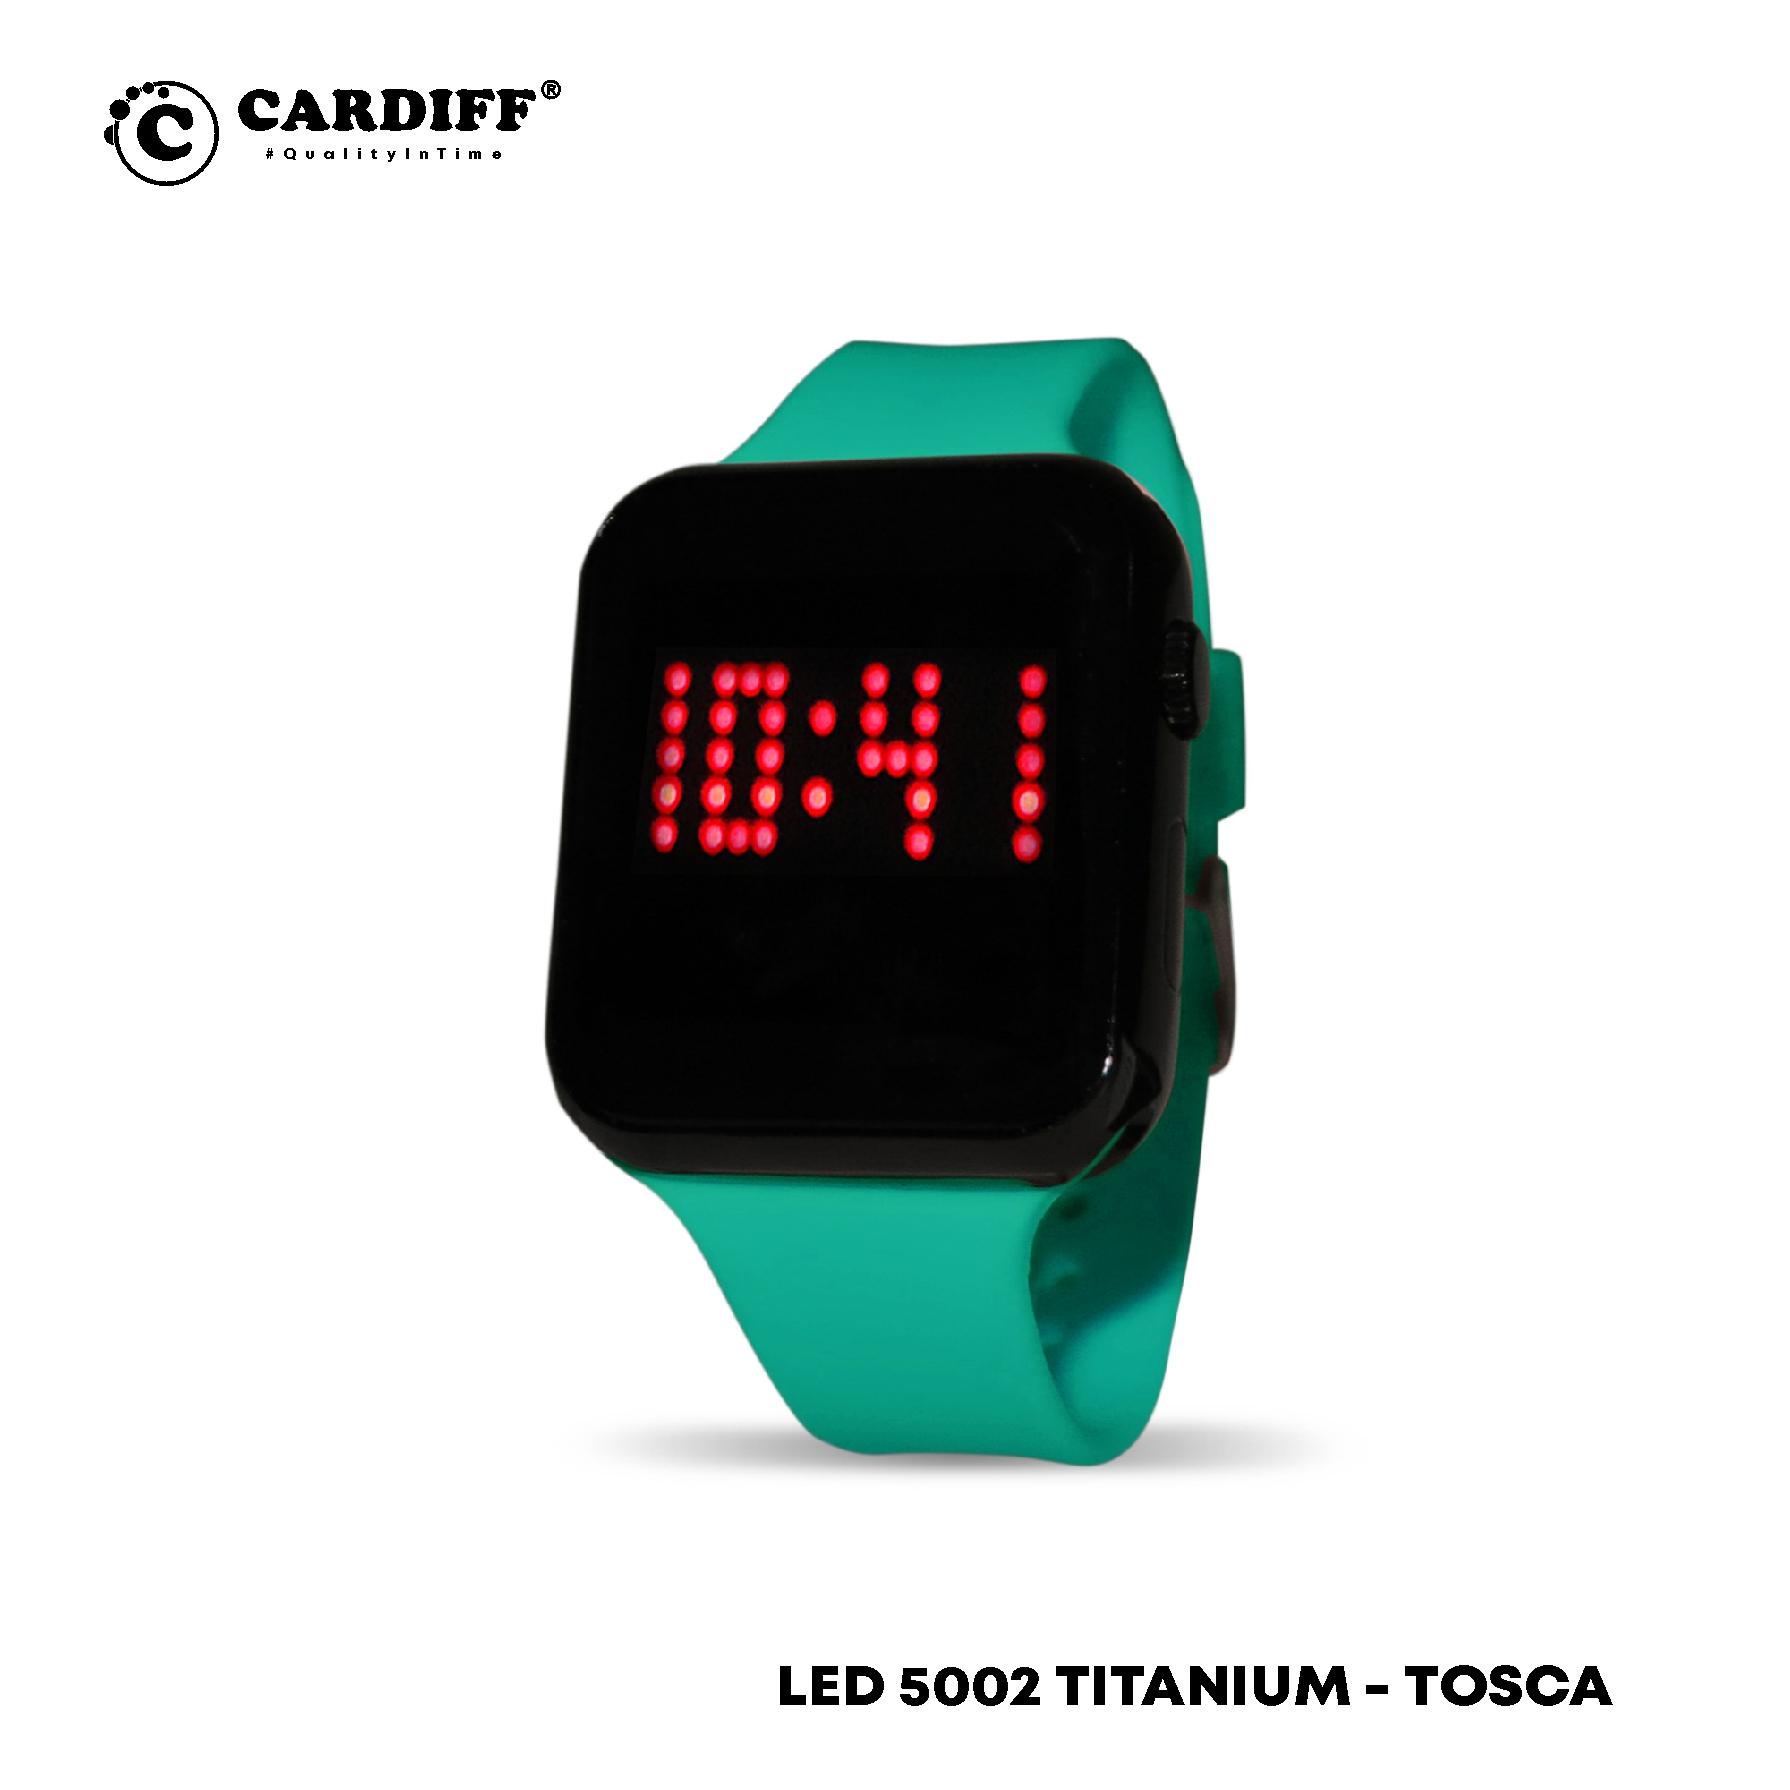 CARDIFF LED 5002 SERIES